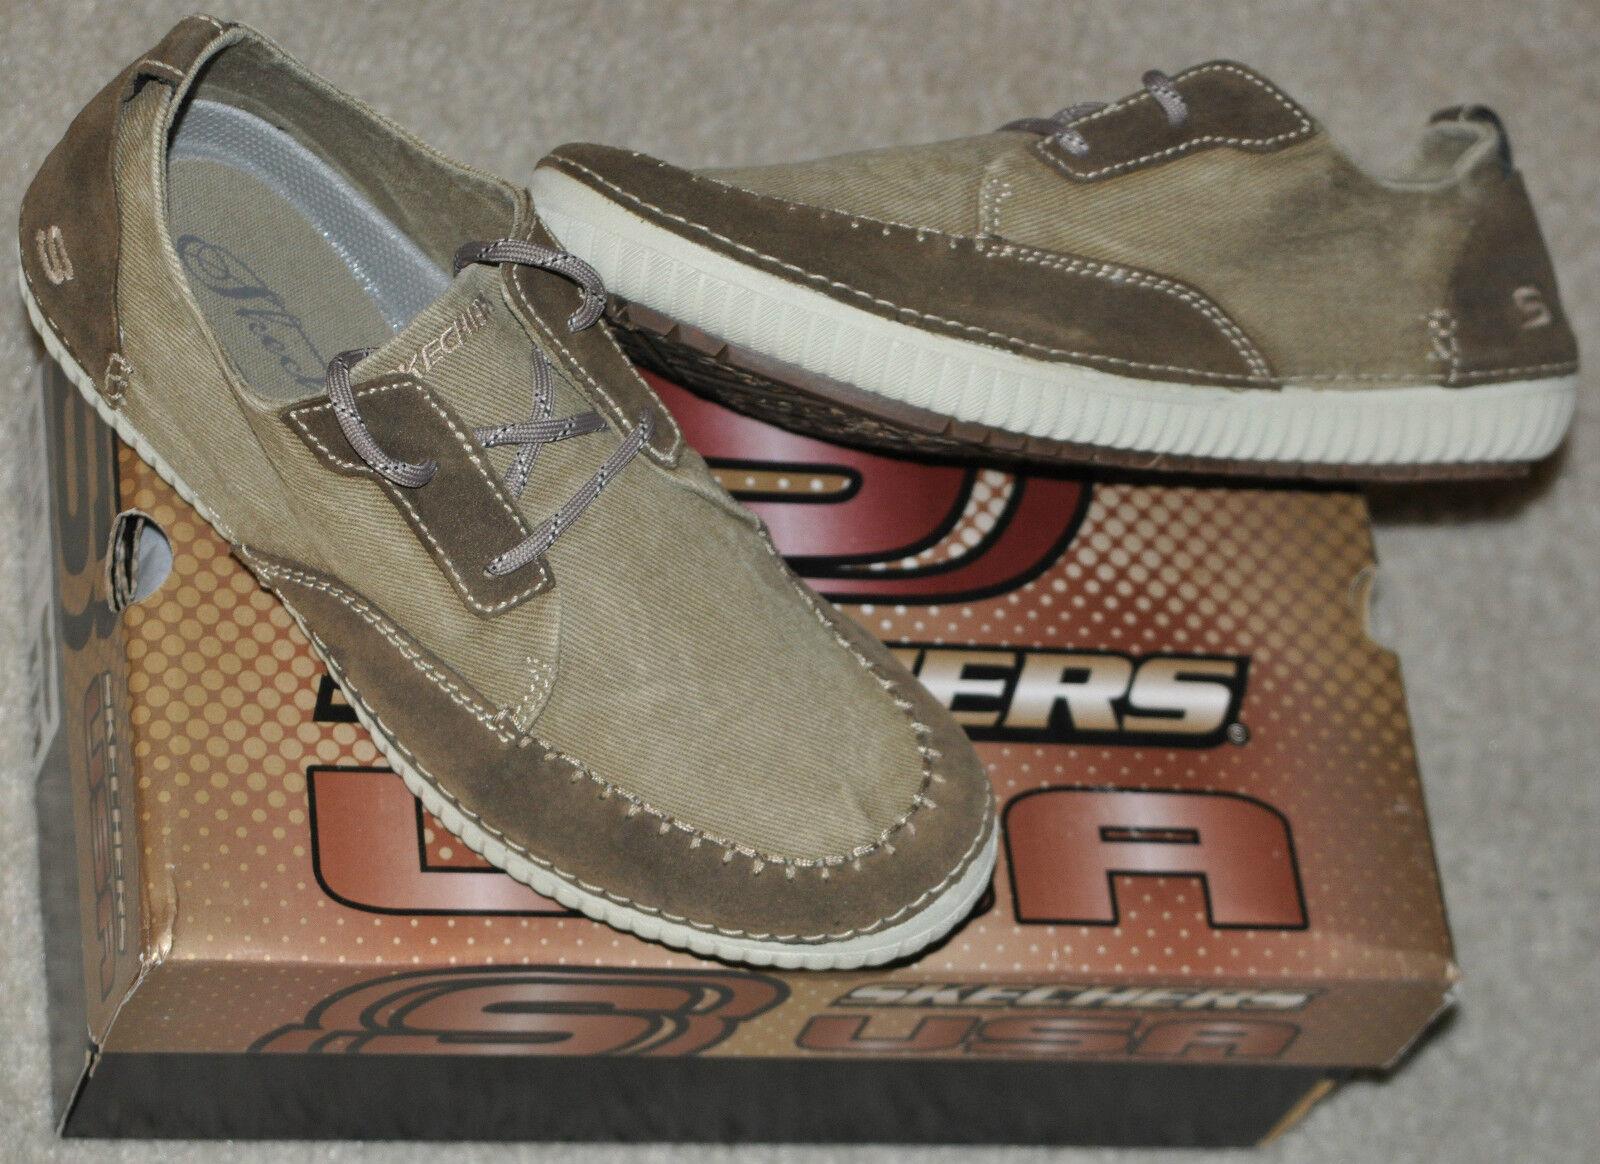 Skechers Men's Odesa Silva Shoes / Sneakers Sz 11.5 Box Brand New with Original Box 11.5 8554ea